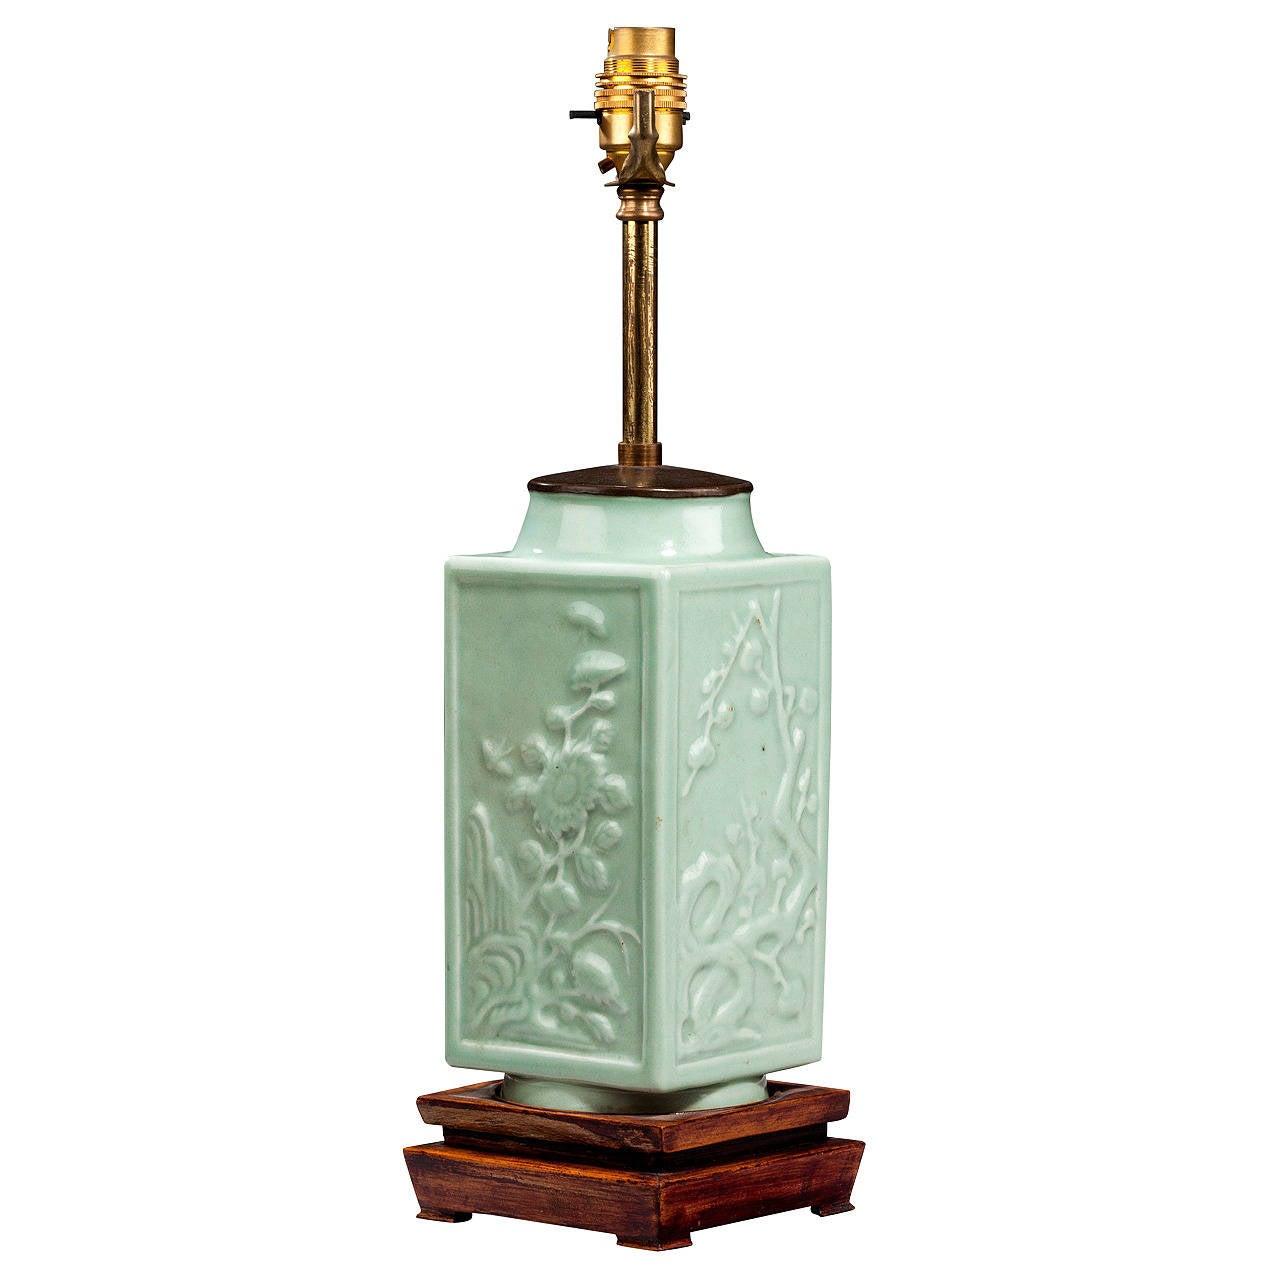 20th century Single Celadon Green Lamp For Sale